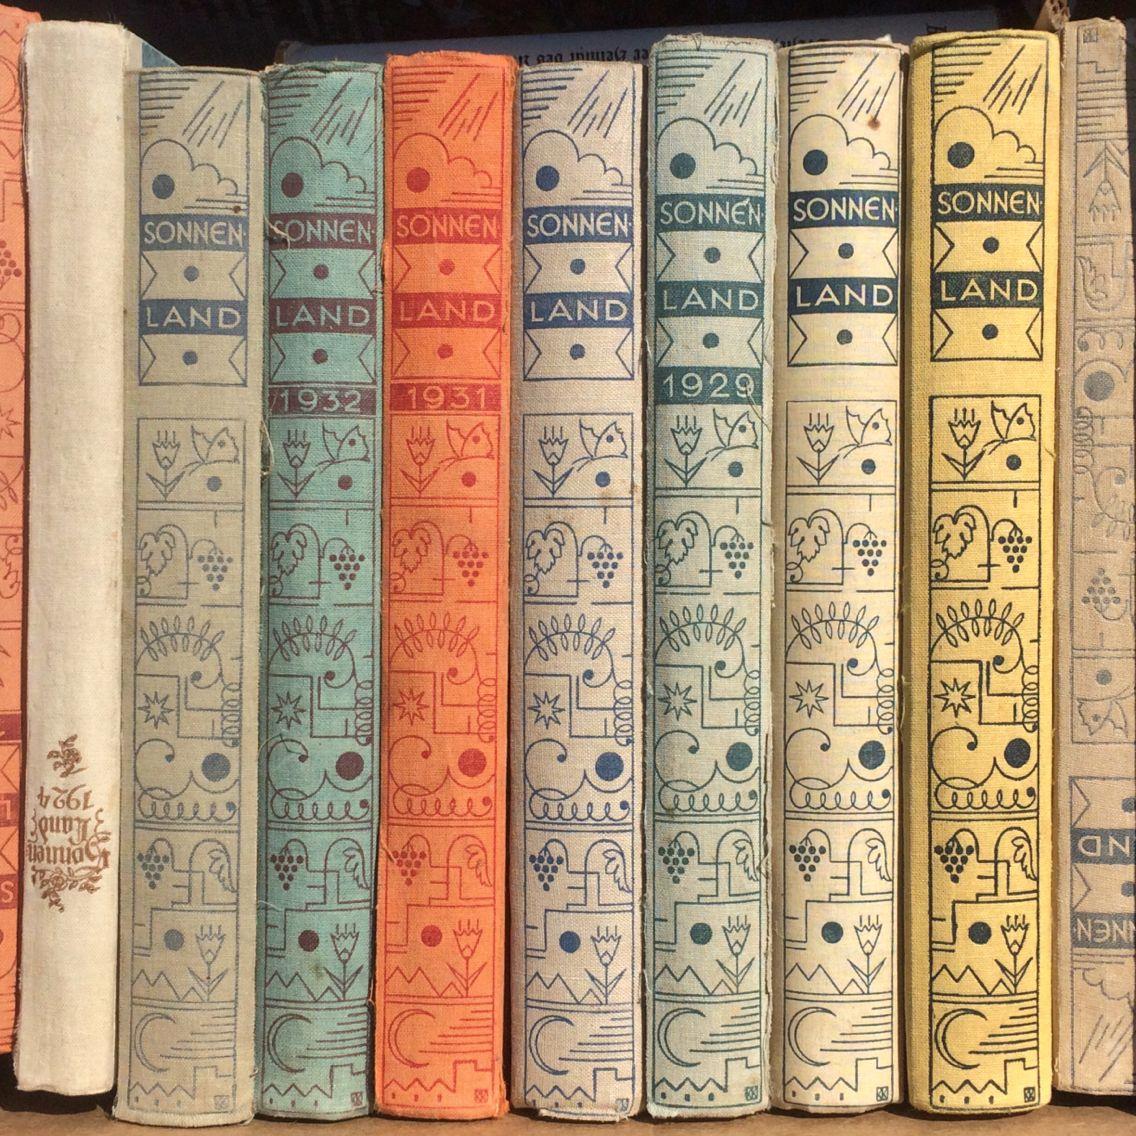 Spine Pattern Book Cover Design Inspiration Book Cover Design Book Design